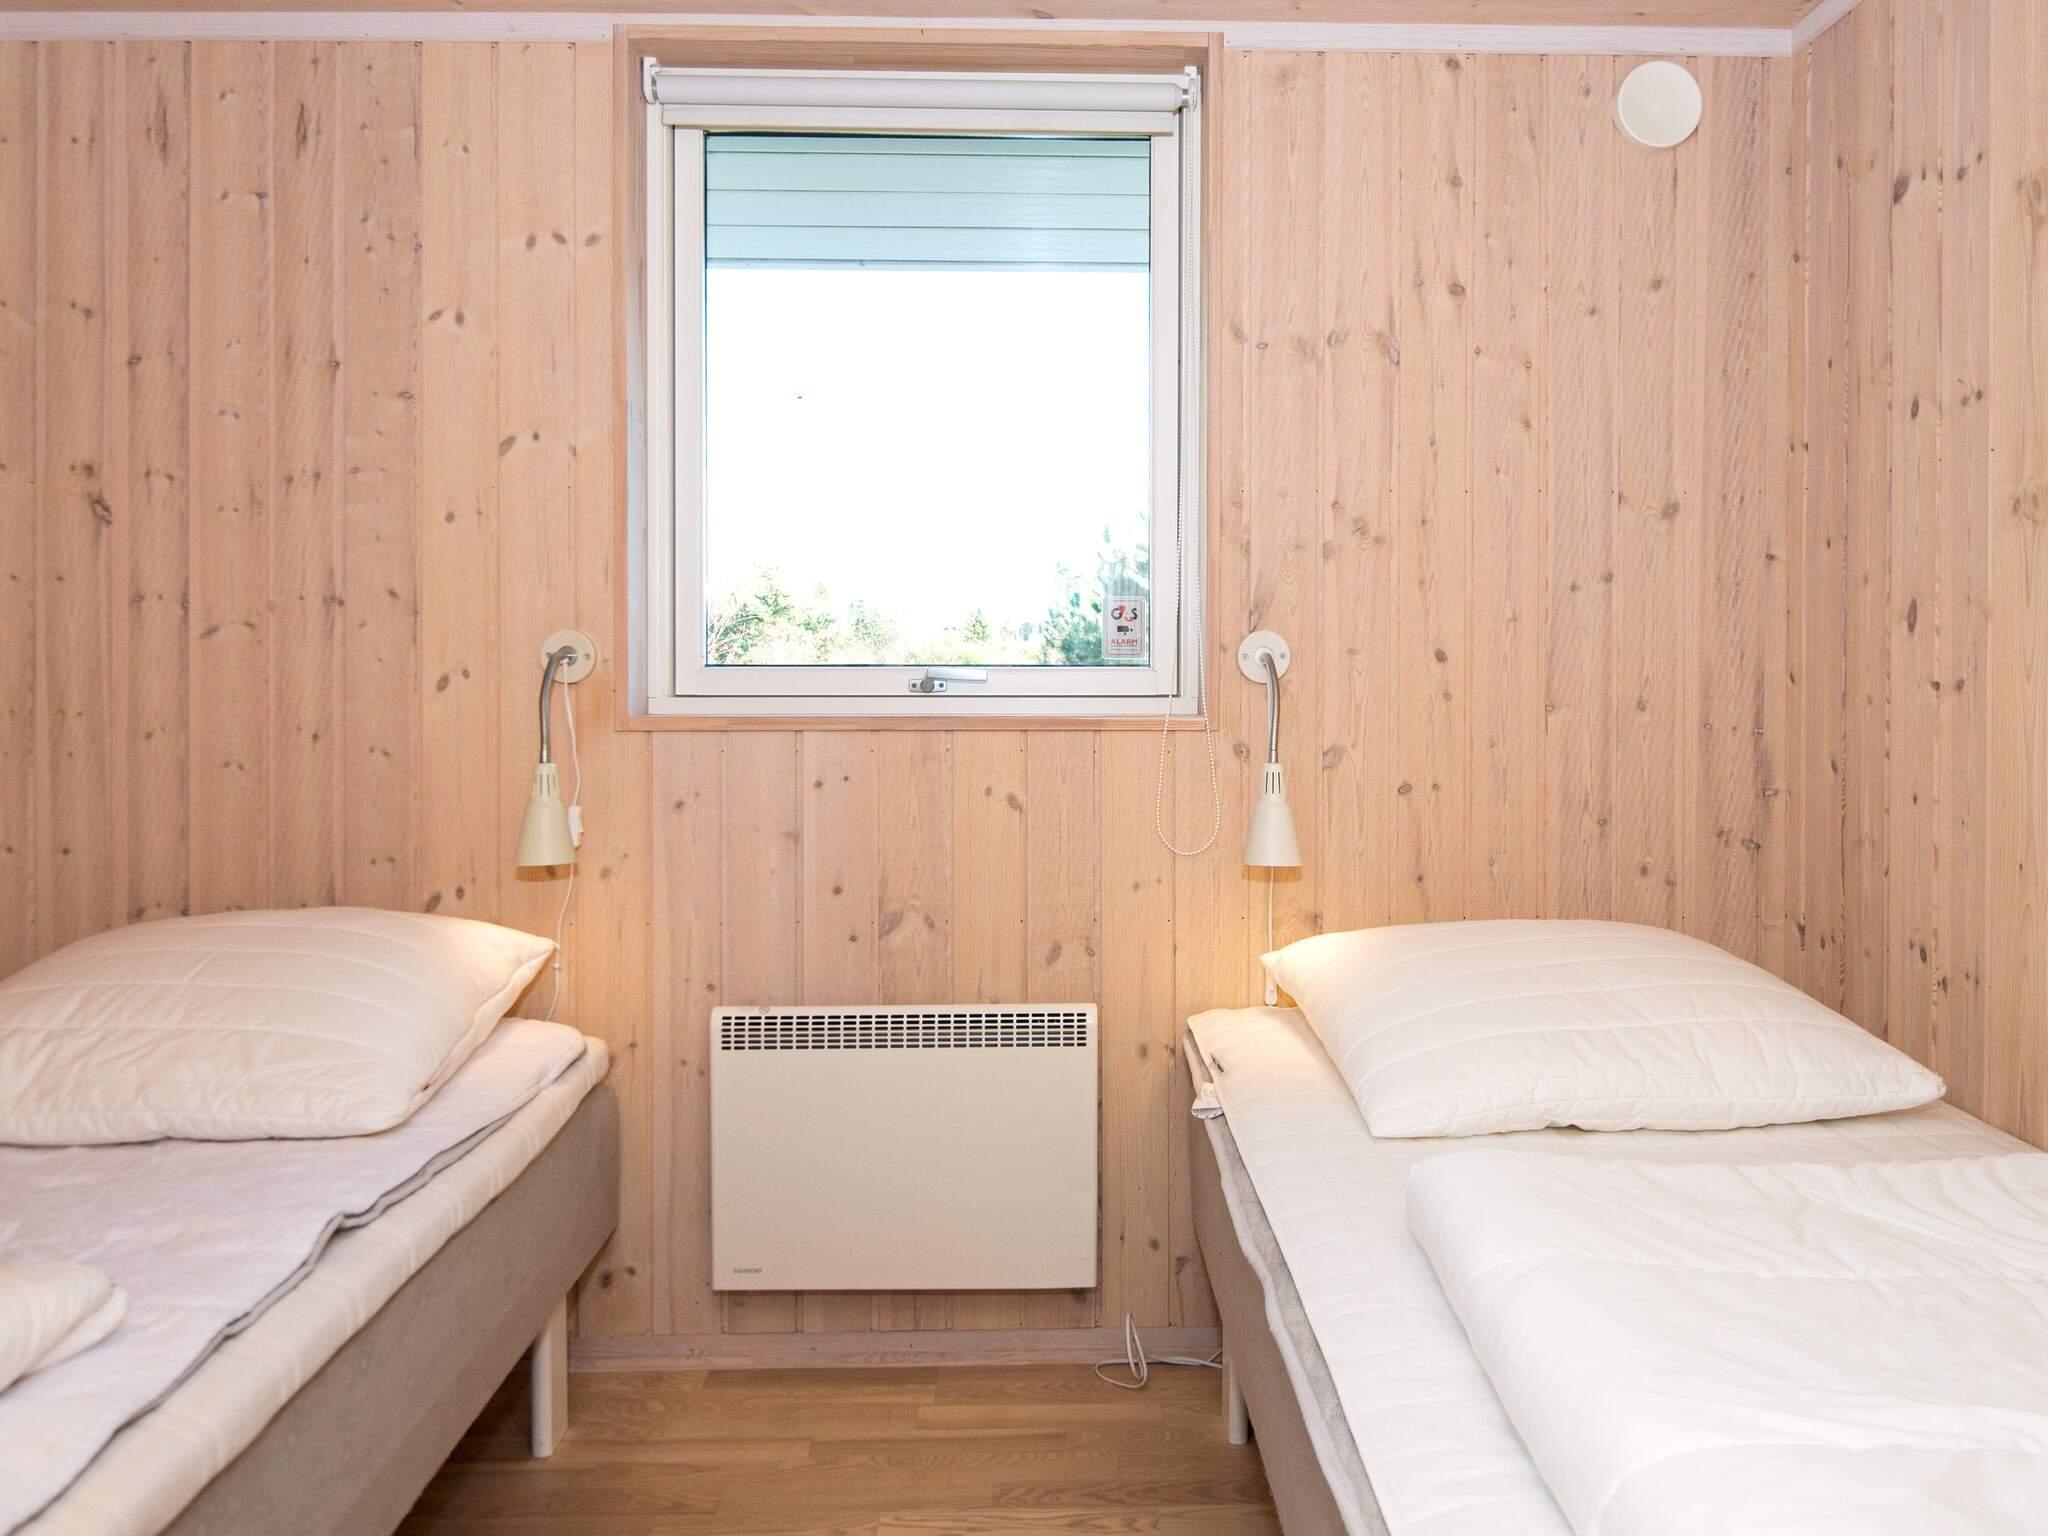 Maison de vacances Helgenæs (681779), Knebel, , Mer Baltique danoise, Danemark, image 11